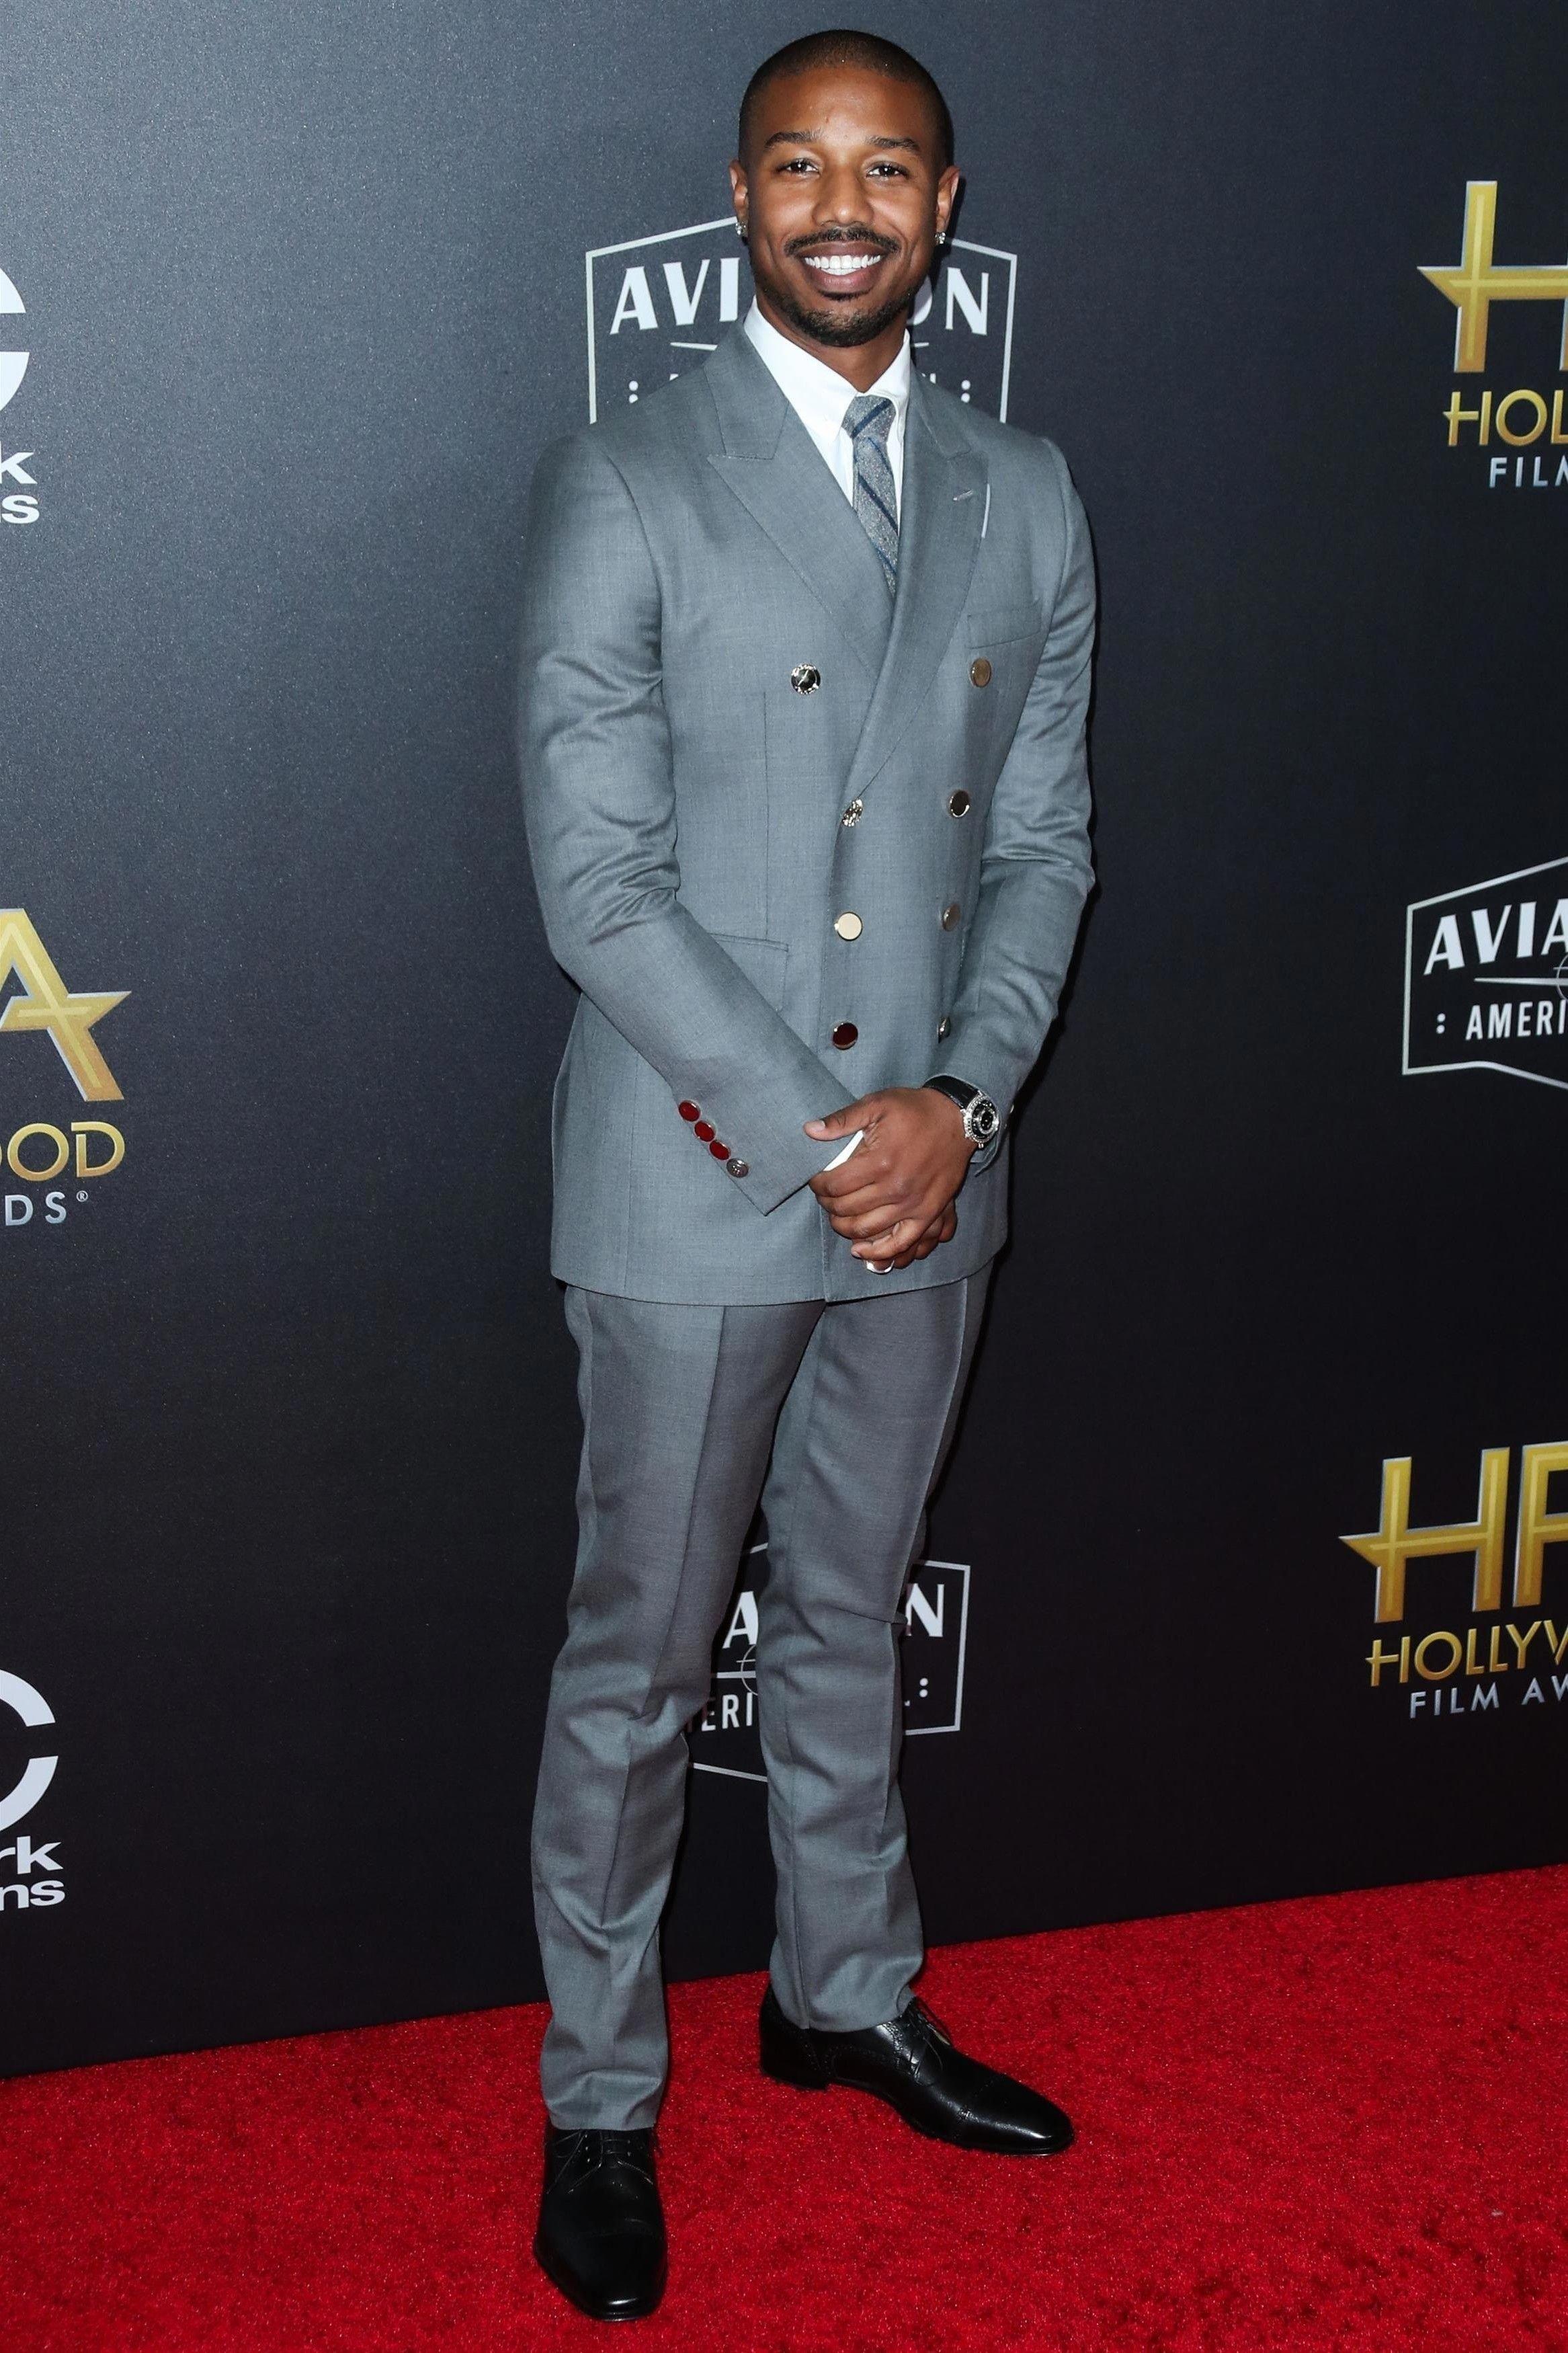 Pin on Hot Men's Fashion - Latest Guys Looks